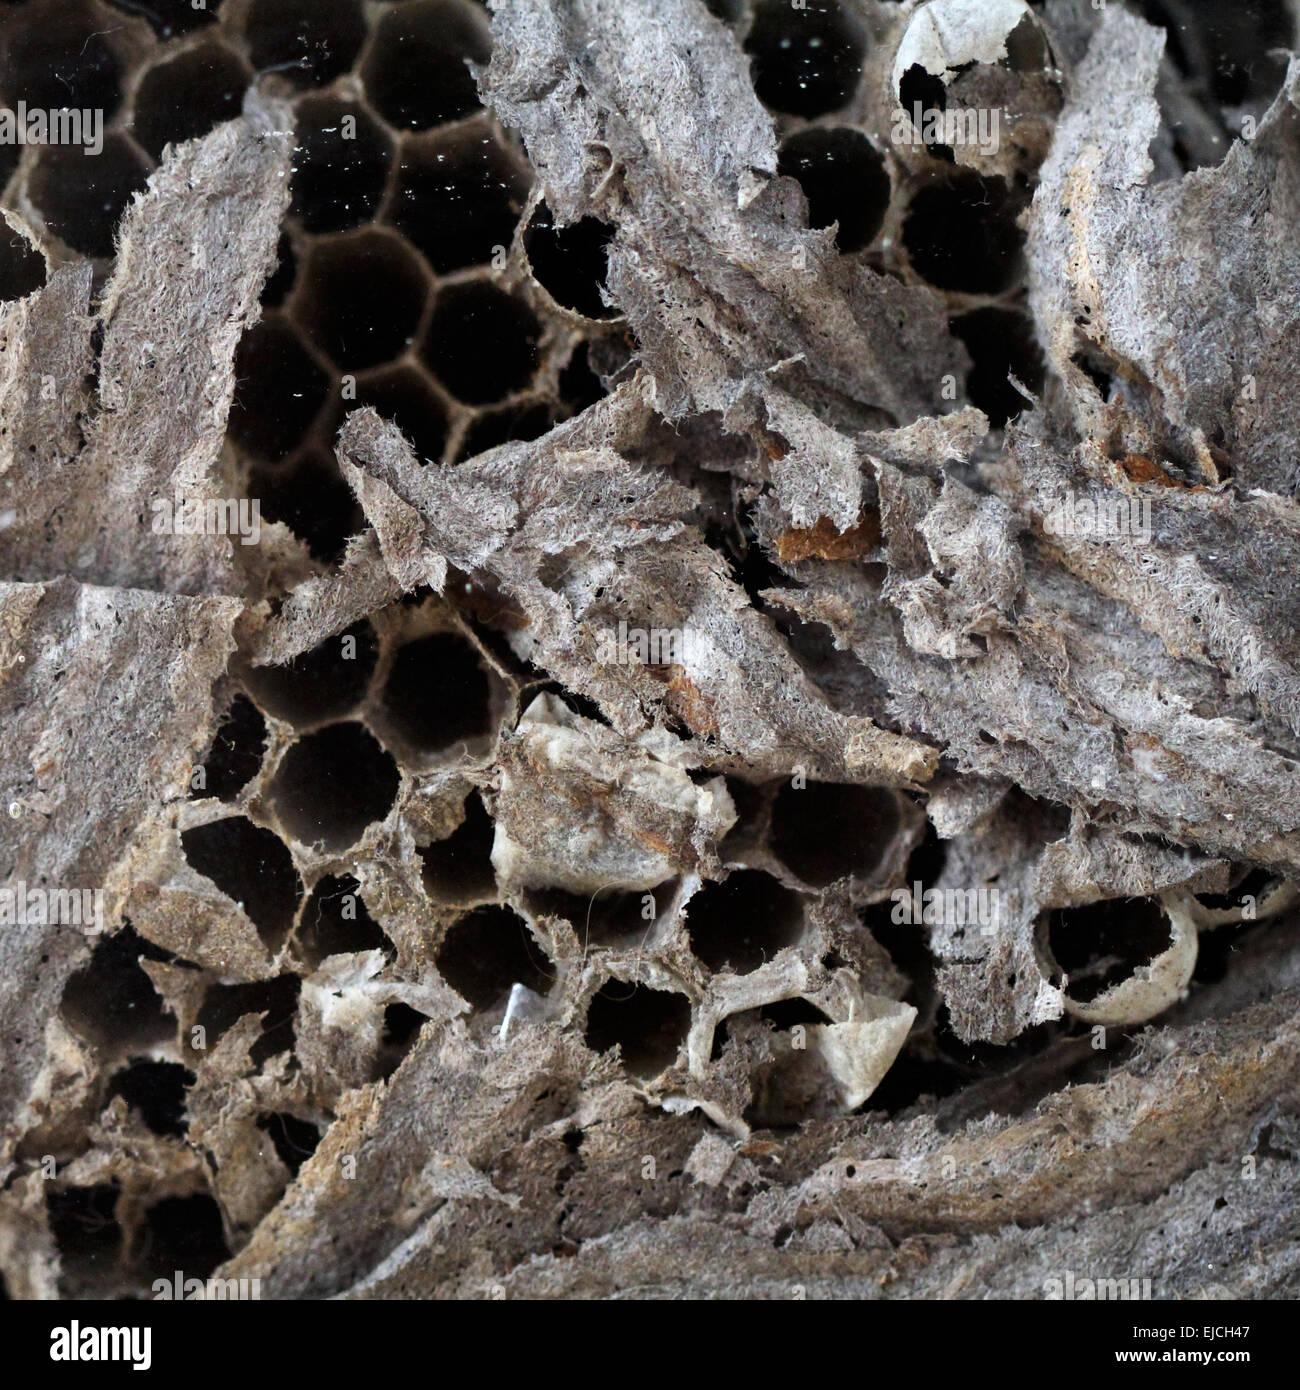 Wasp's Nest - Stock Image